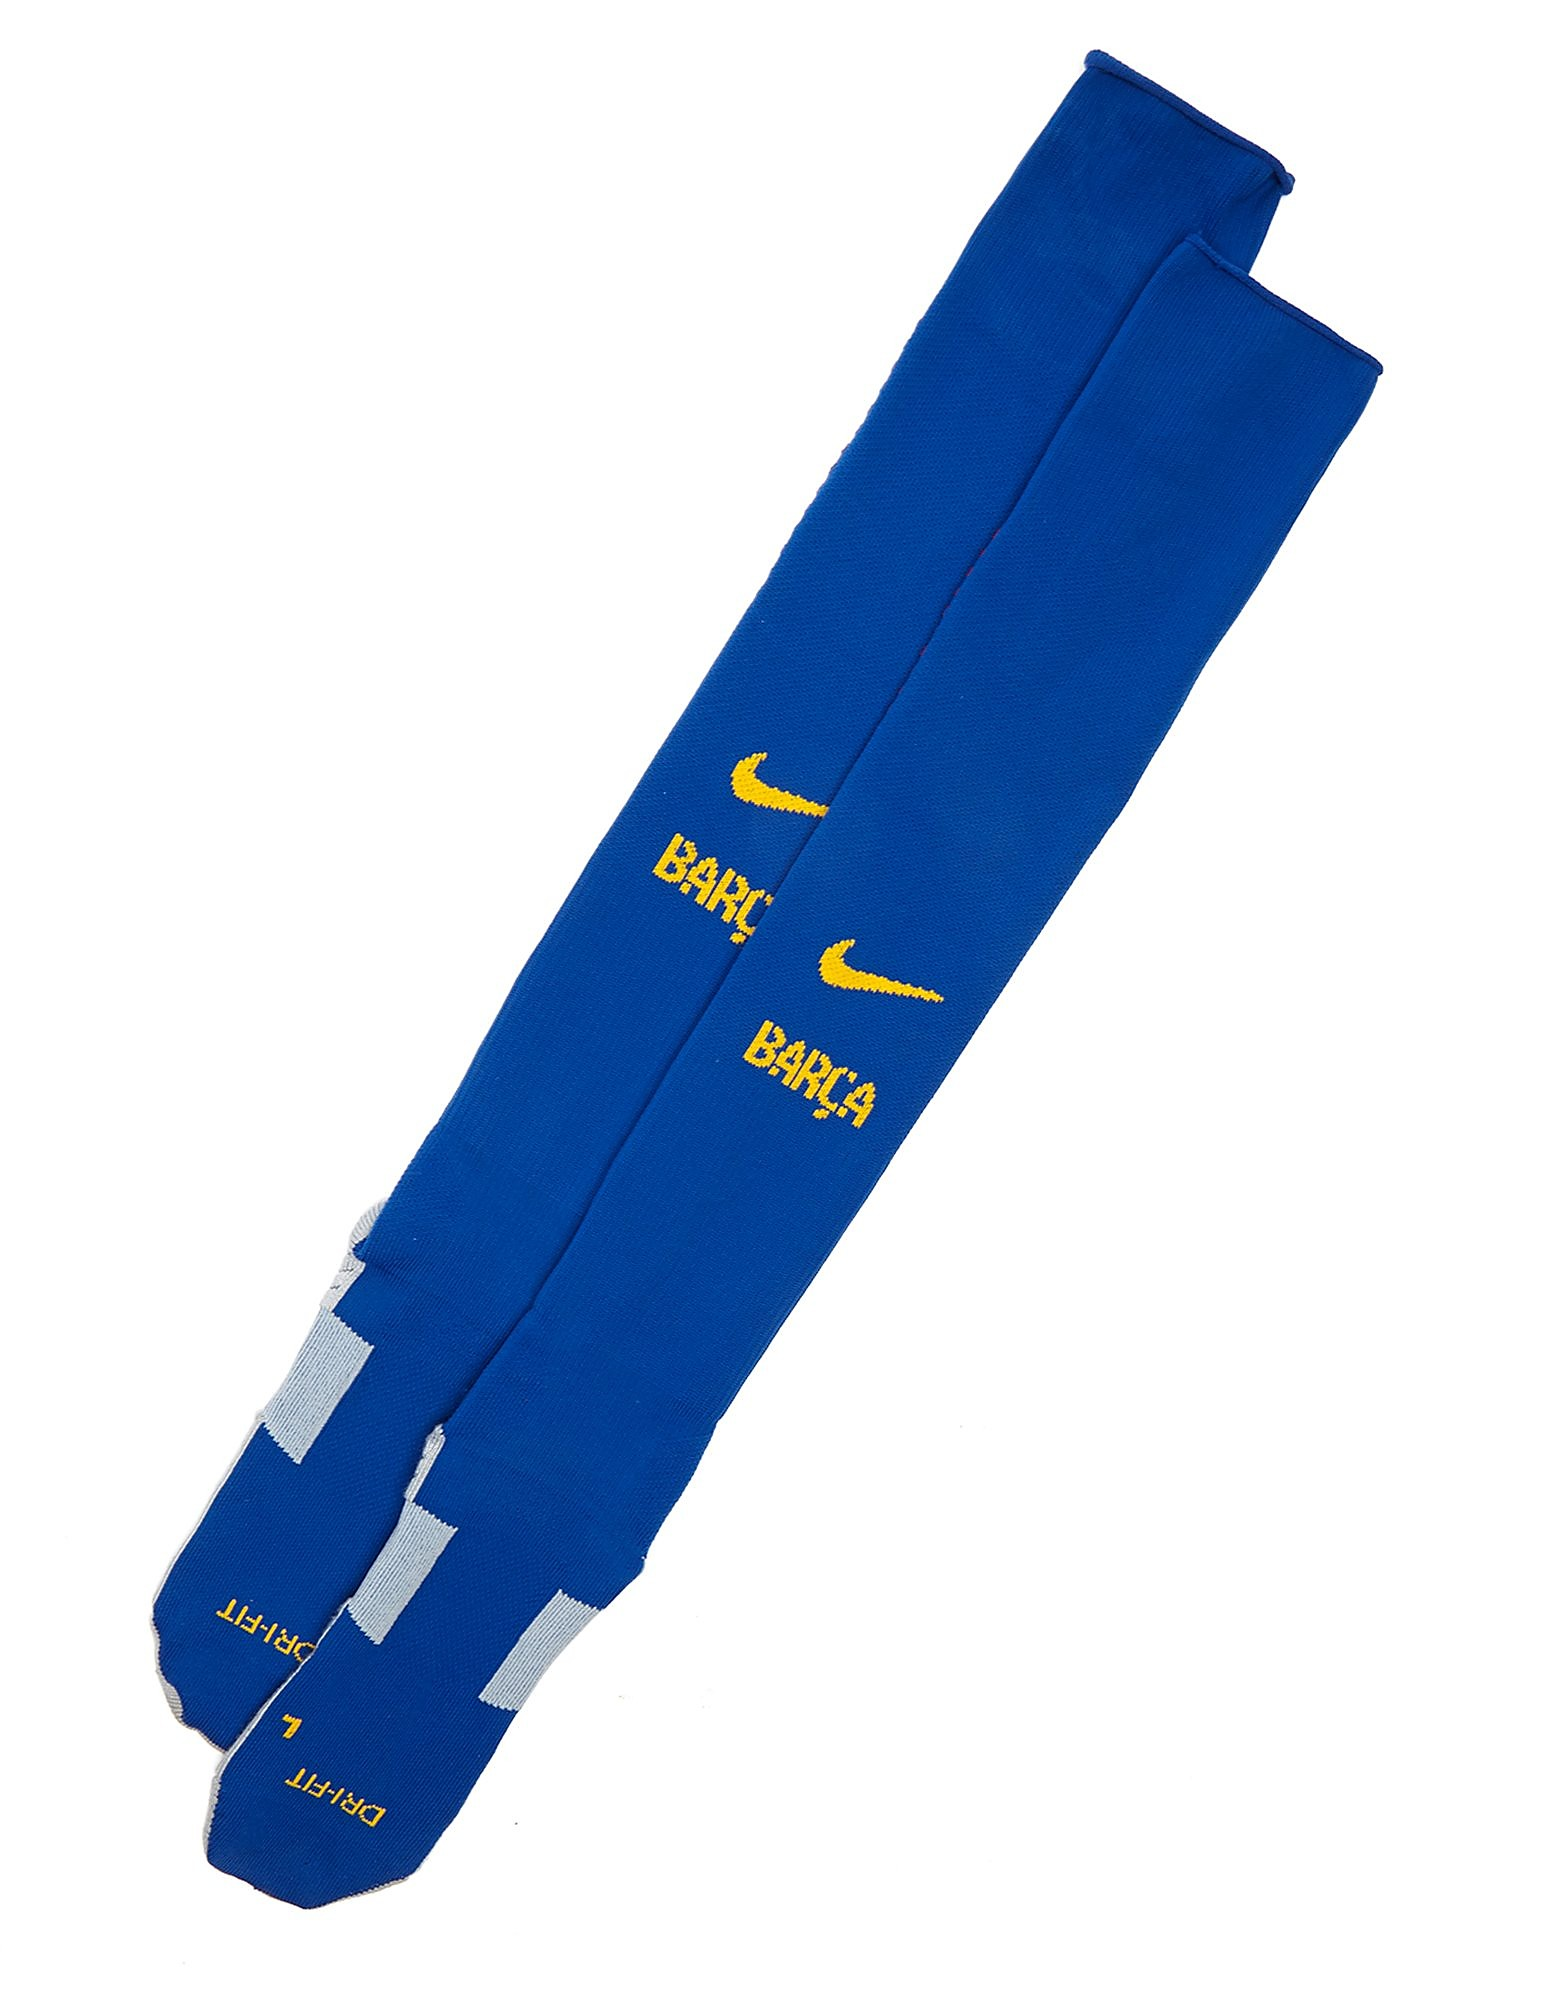 Nike FC Barcelona 2016/17 Home Socks